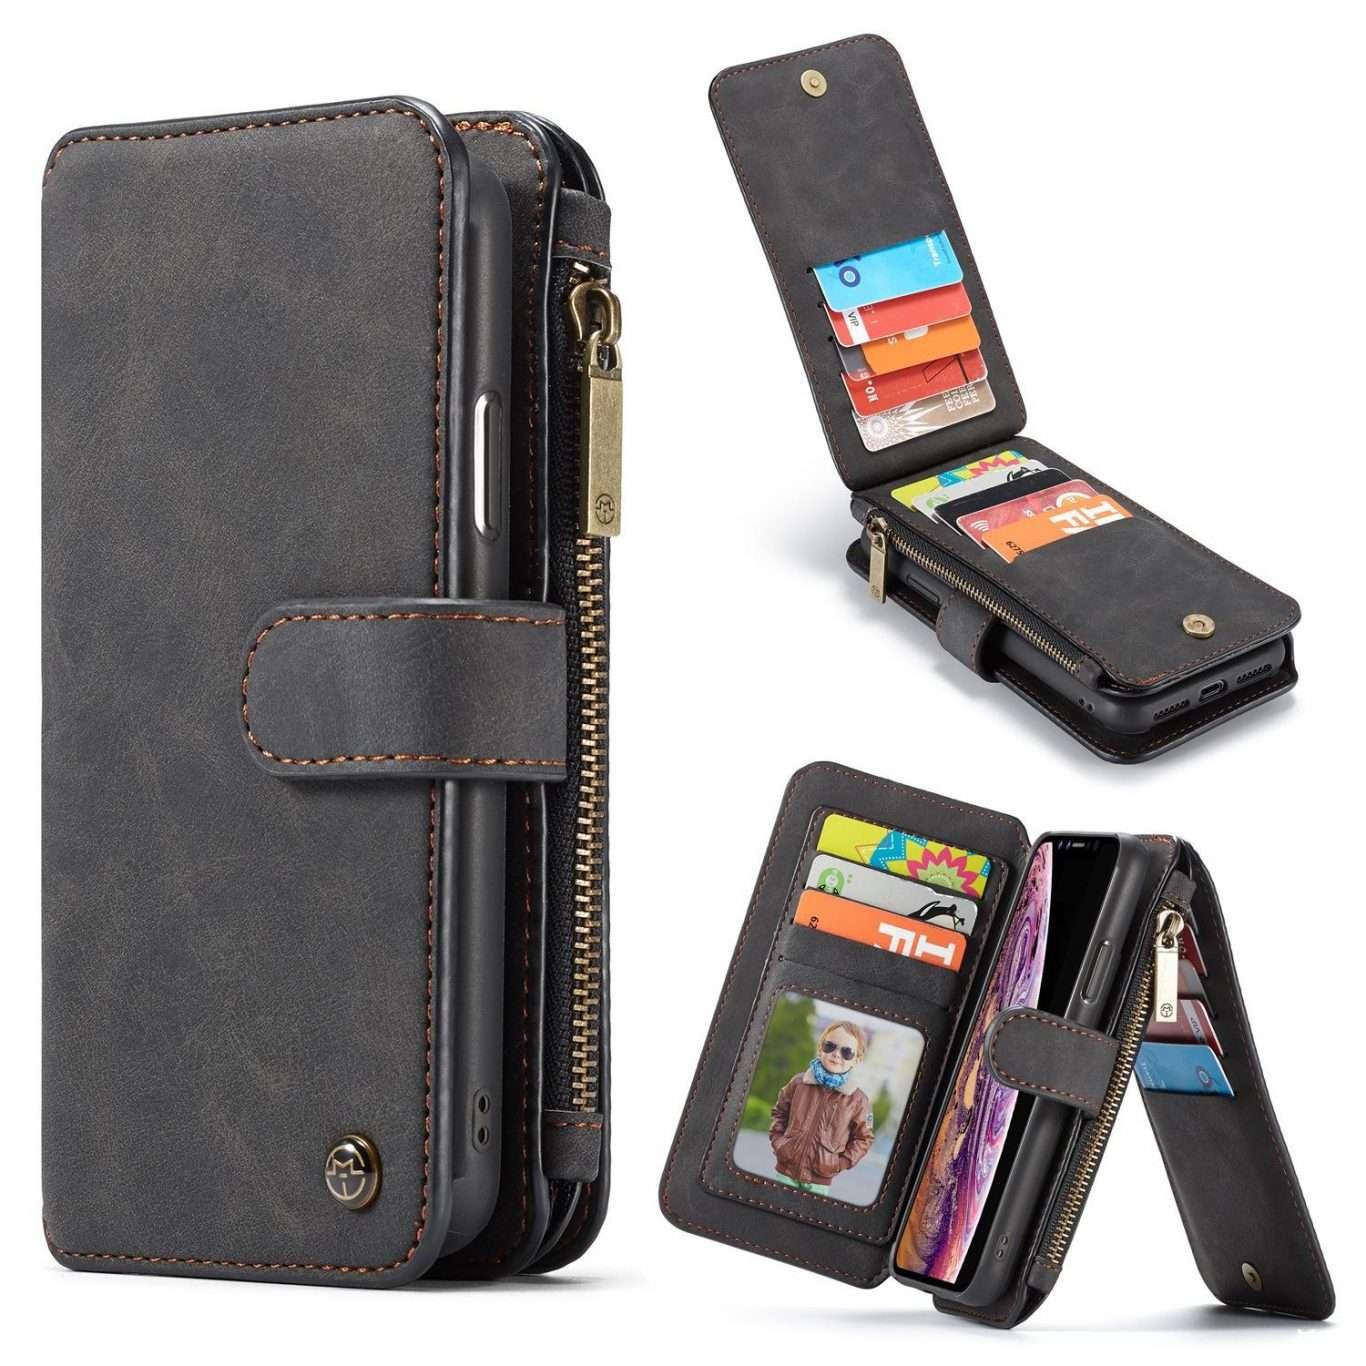 KL-02558 SAMSUNG Phone Leather Case – Black